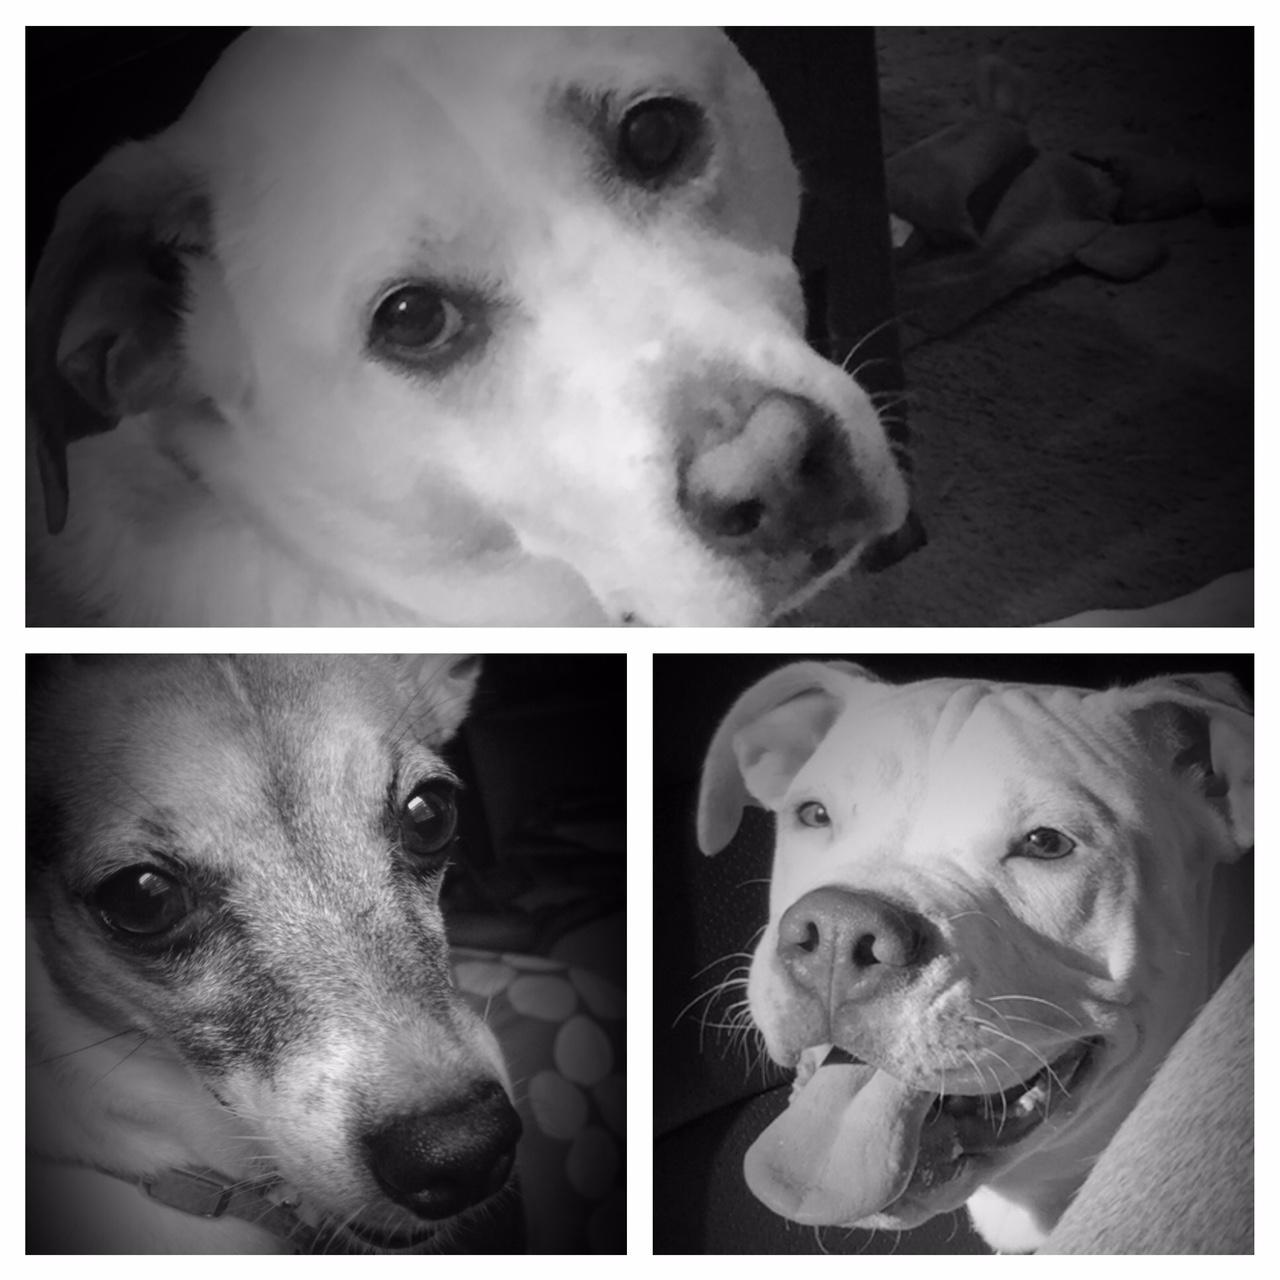 Santana [Lab mix] - top, Celine [Toy Fox Terrier]- left, Zayne [American Pitbull Terrier] - right